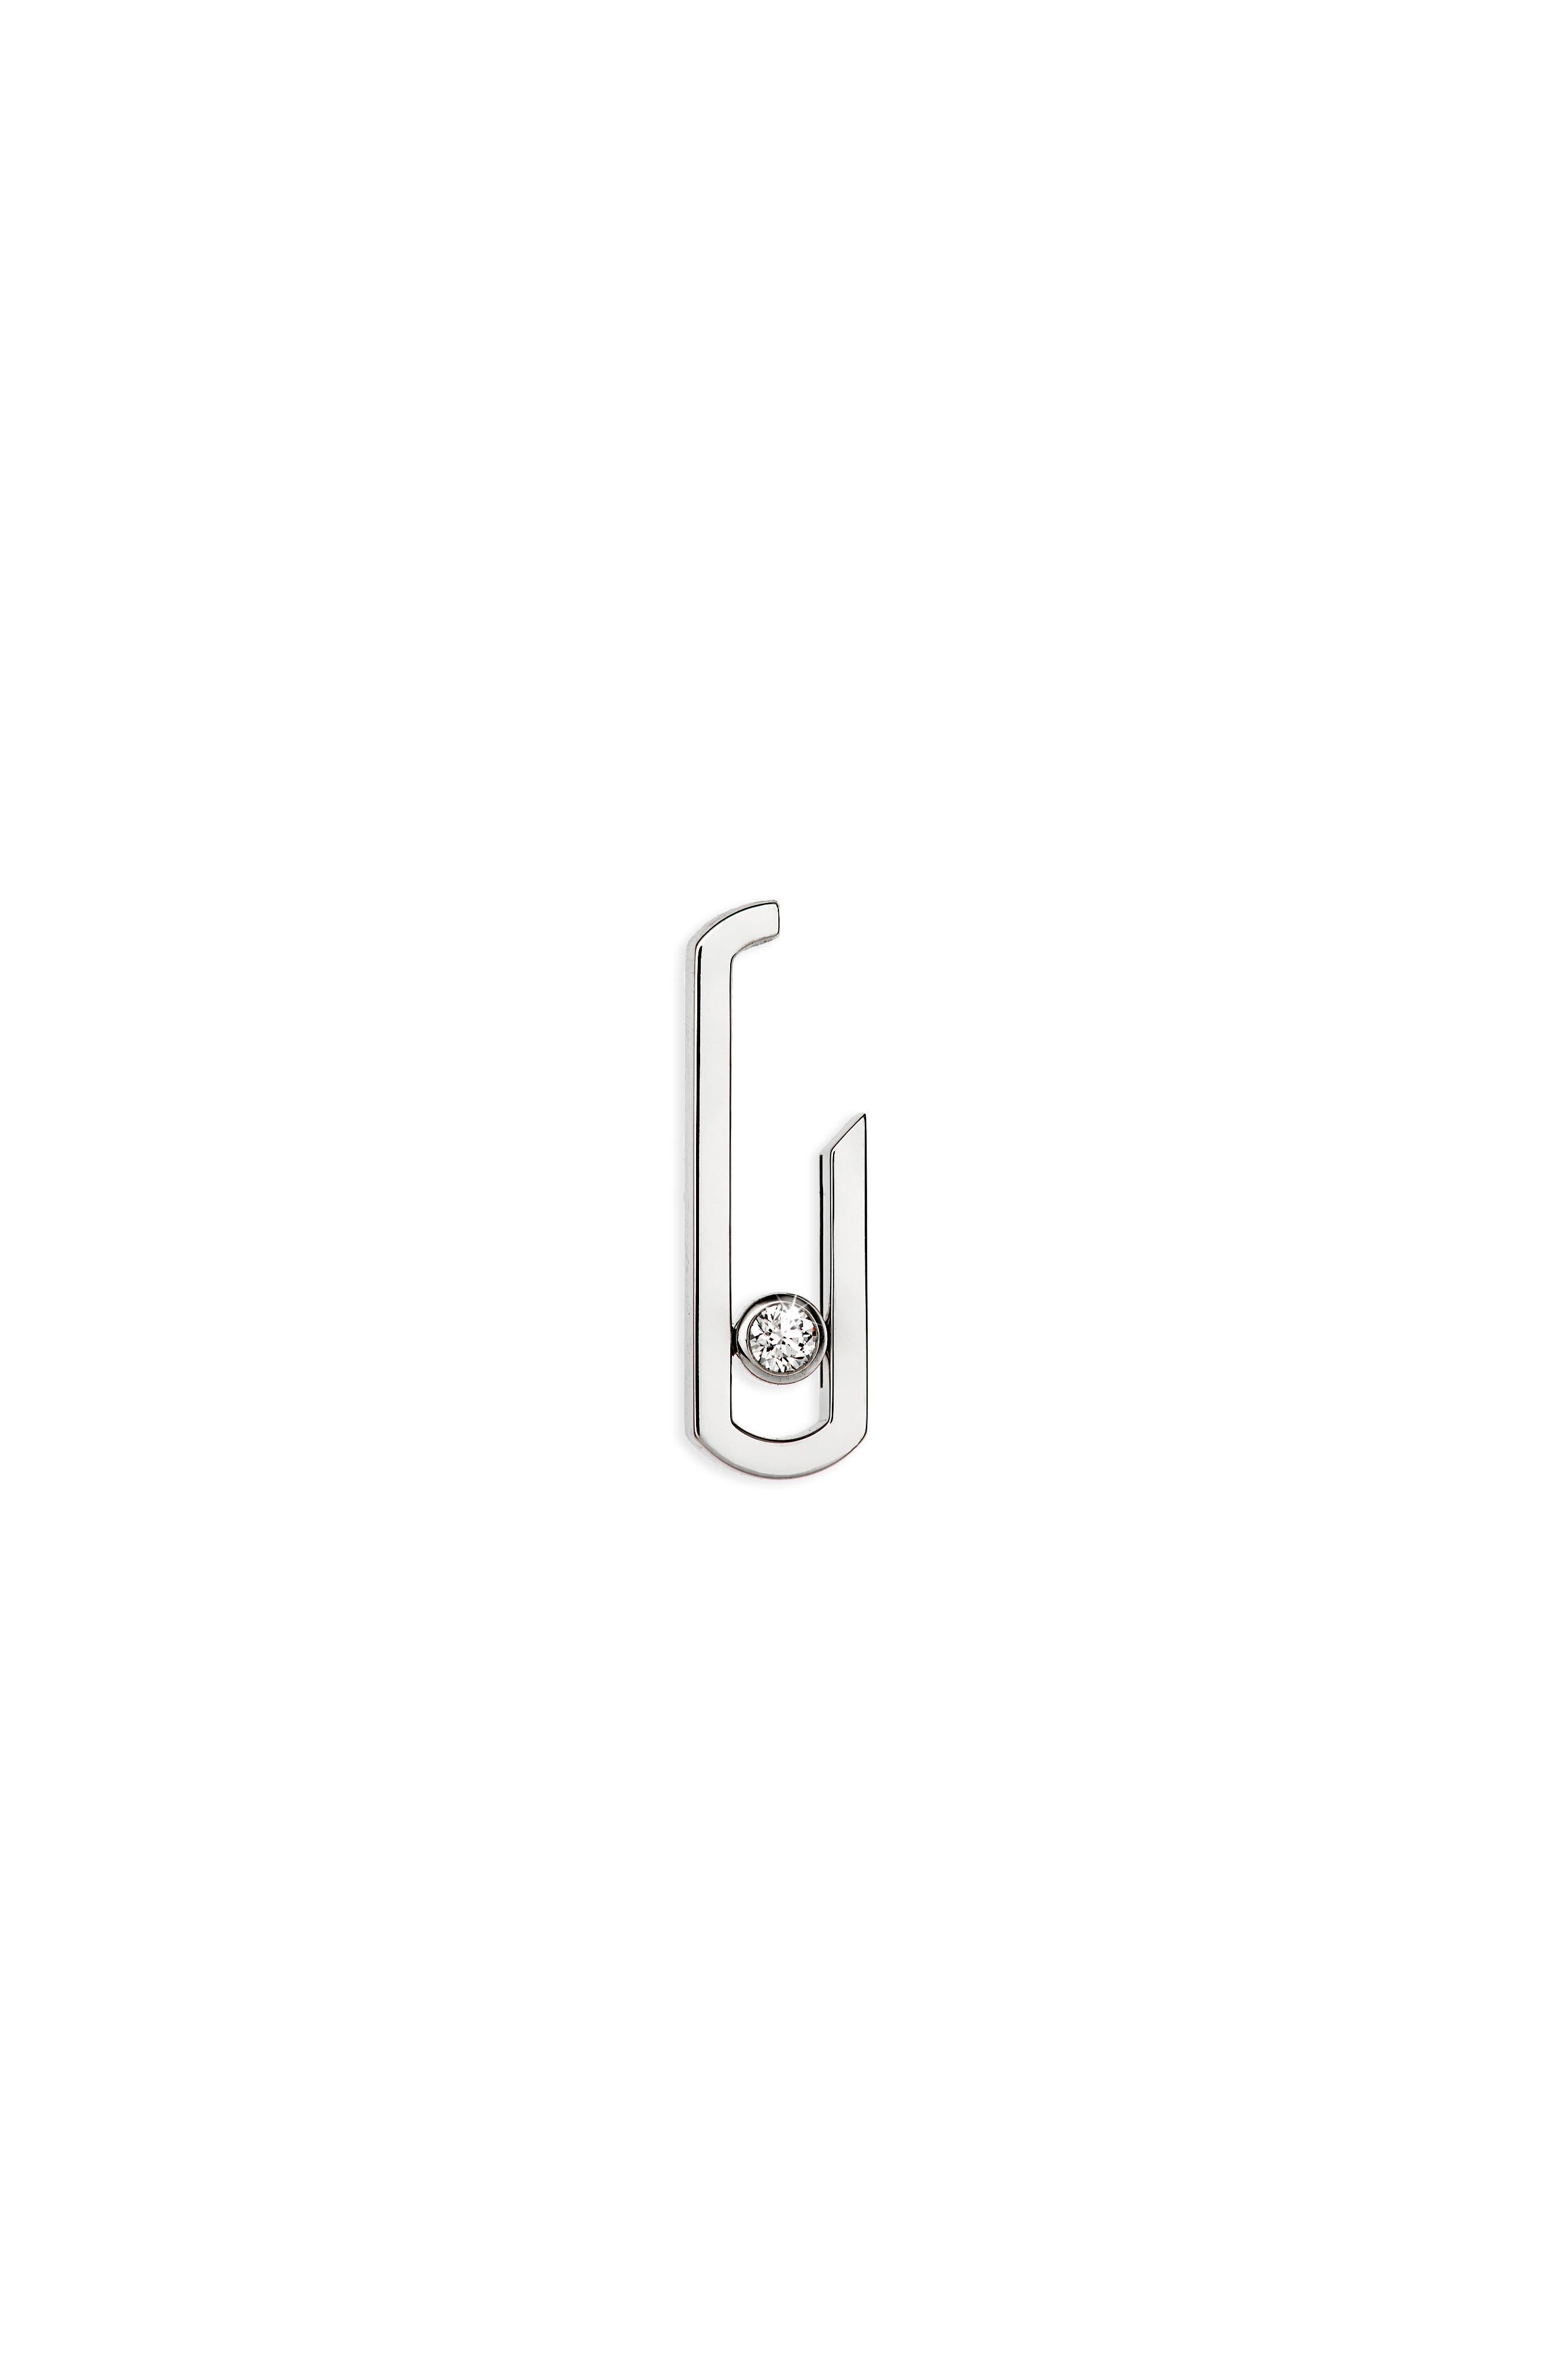 Move Addiction by Gigi Hadid Diamond Earrings,                             Main thumbnail 1, color,                             WHITE GOLD